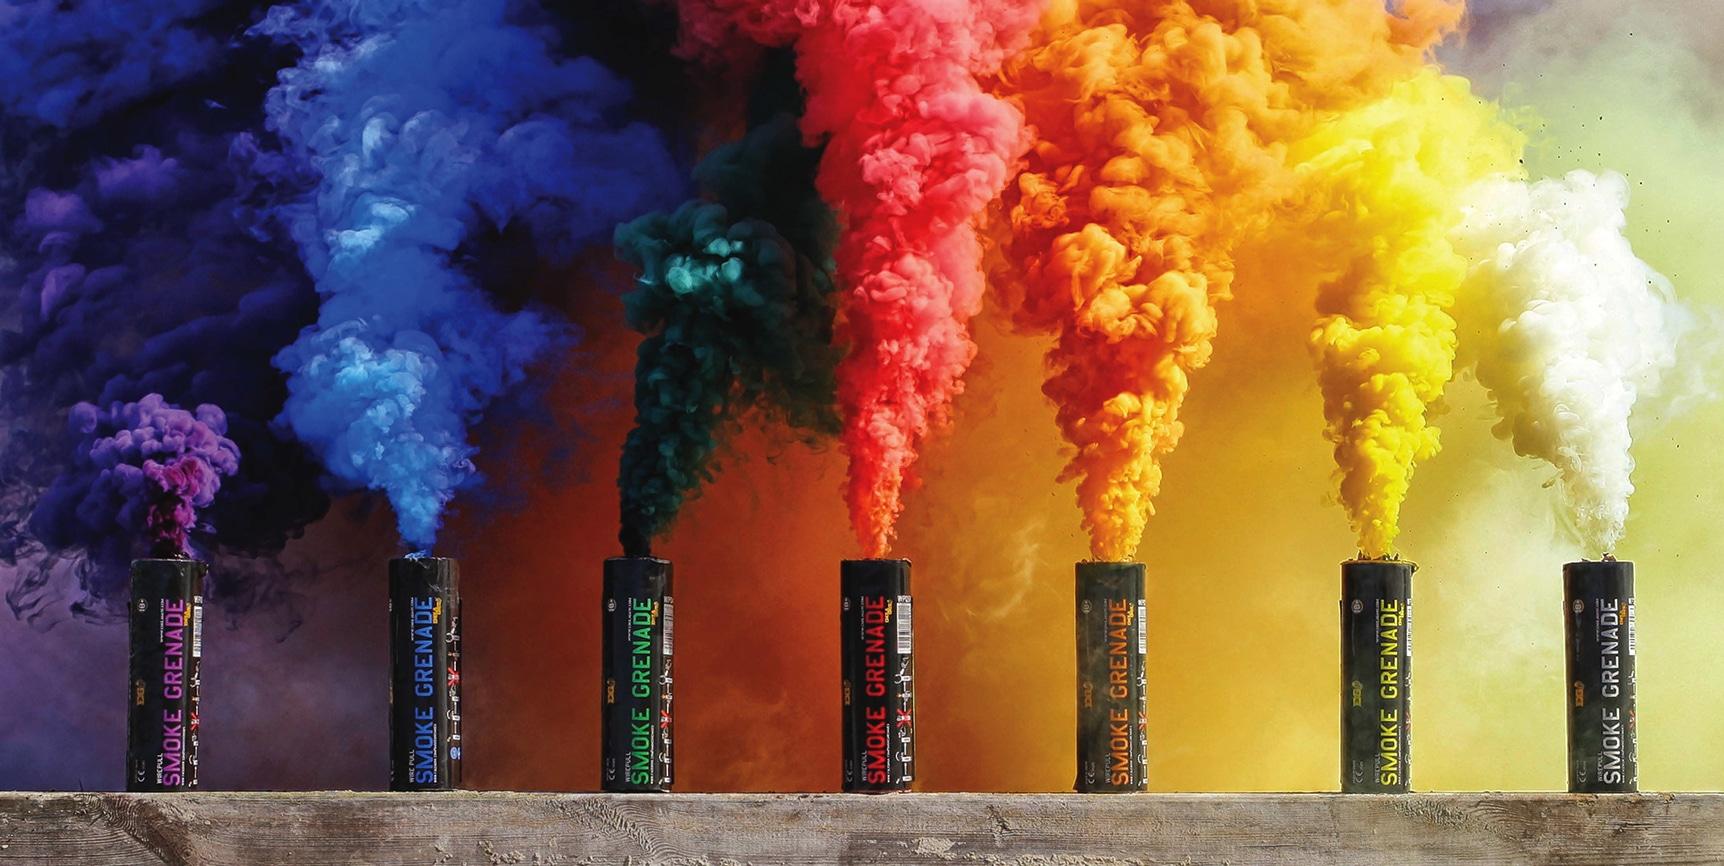 Rainbow grenade